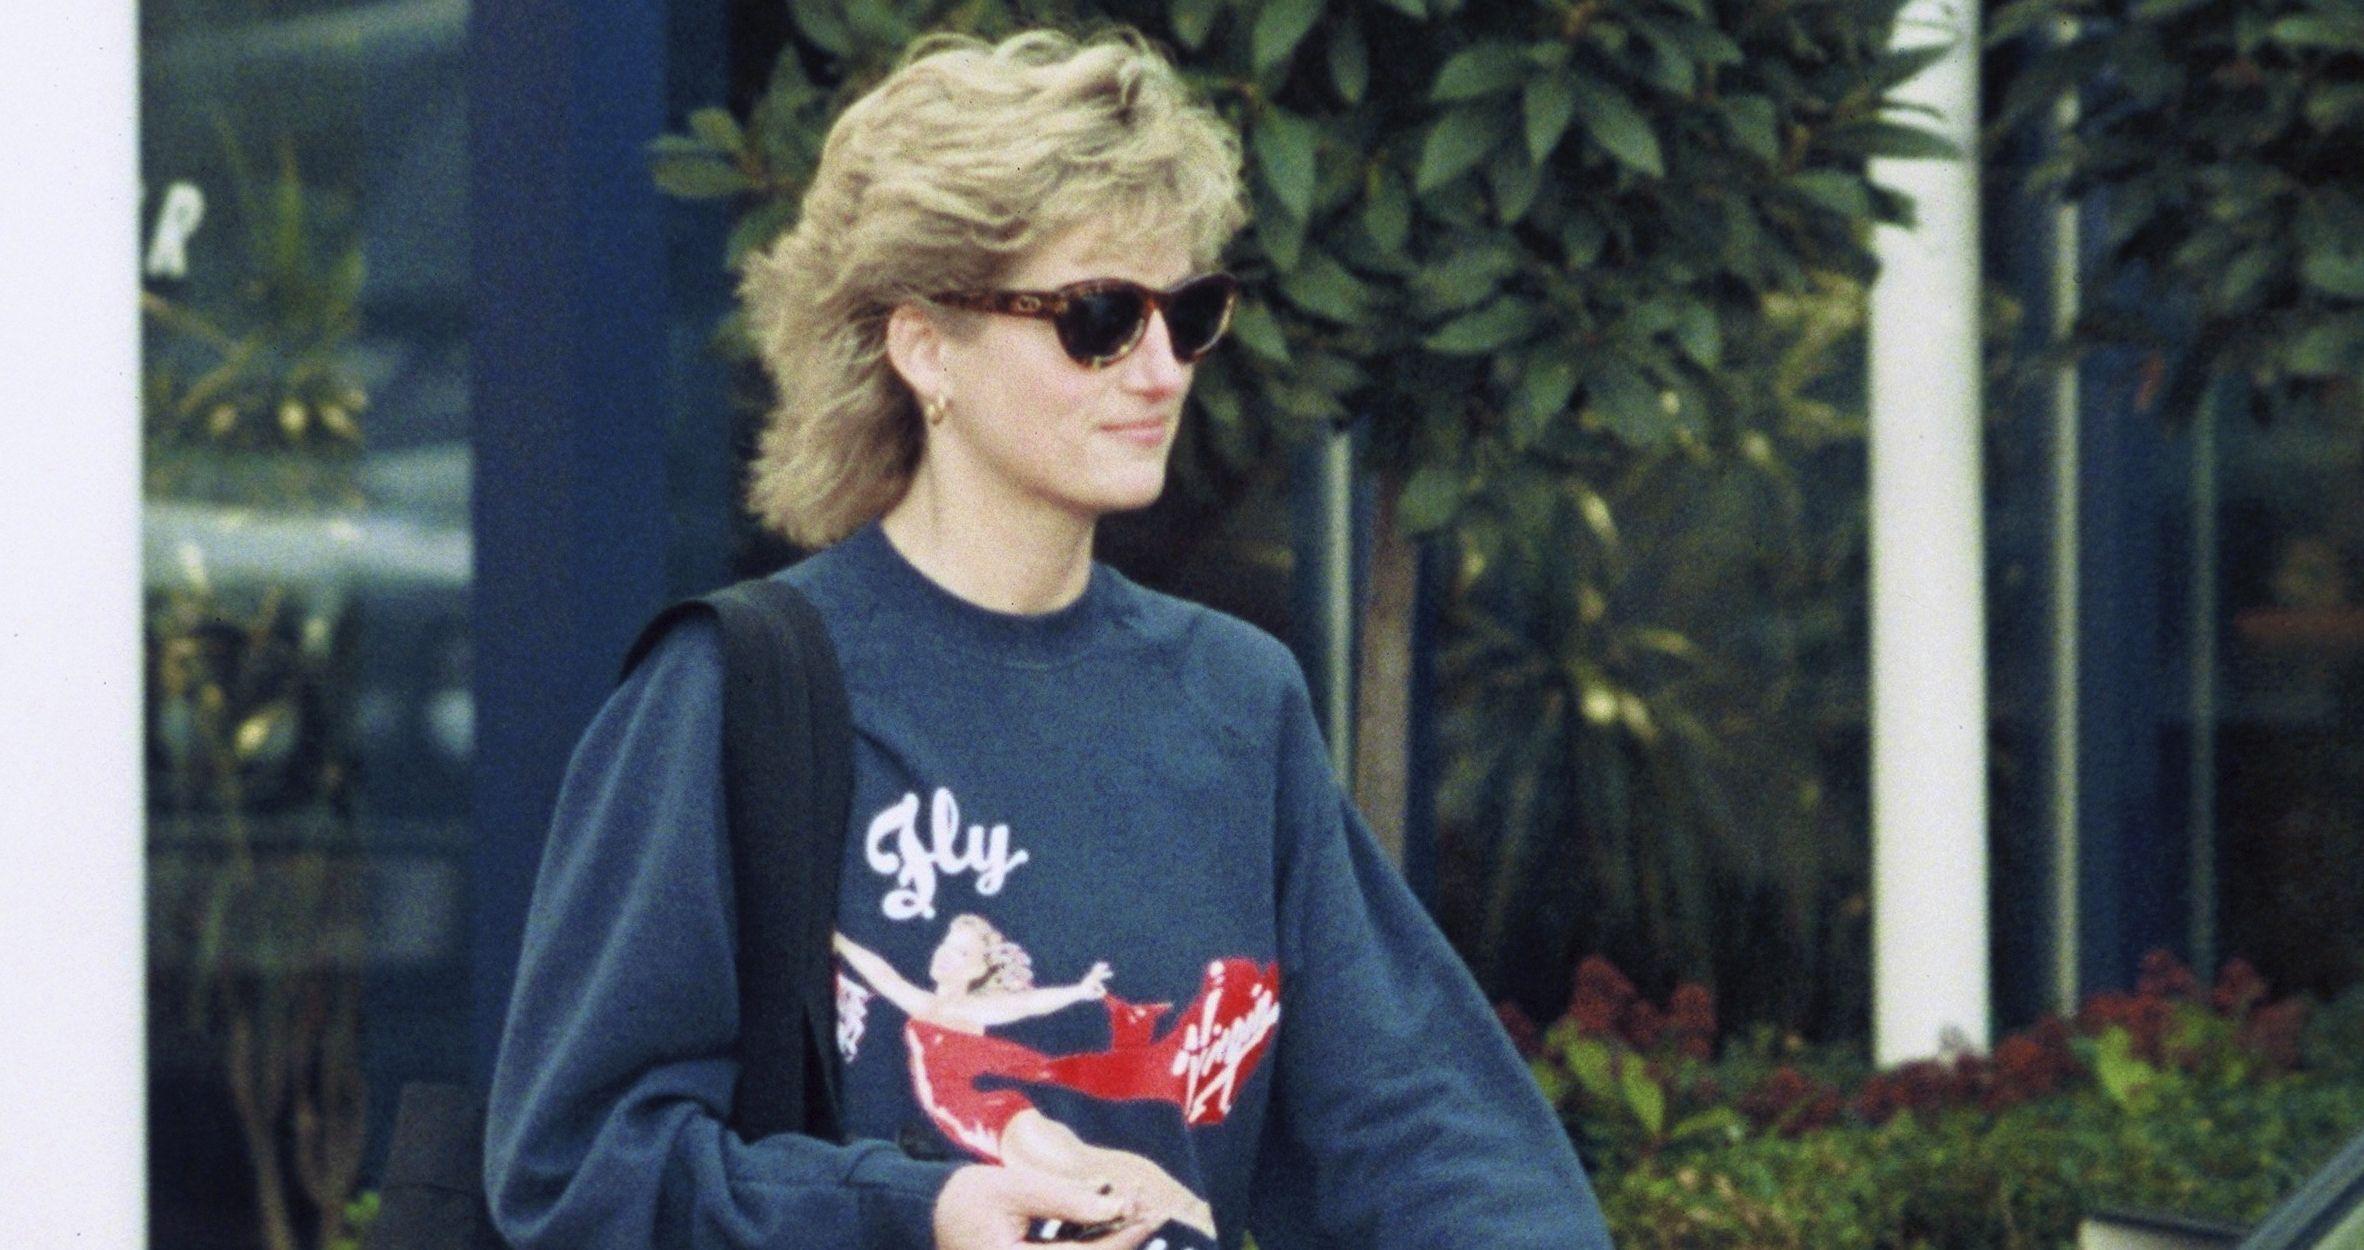 Princess Diana wearing a blue sweater